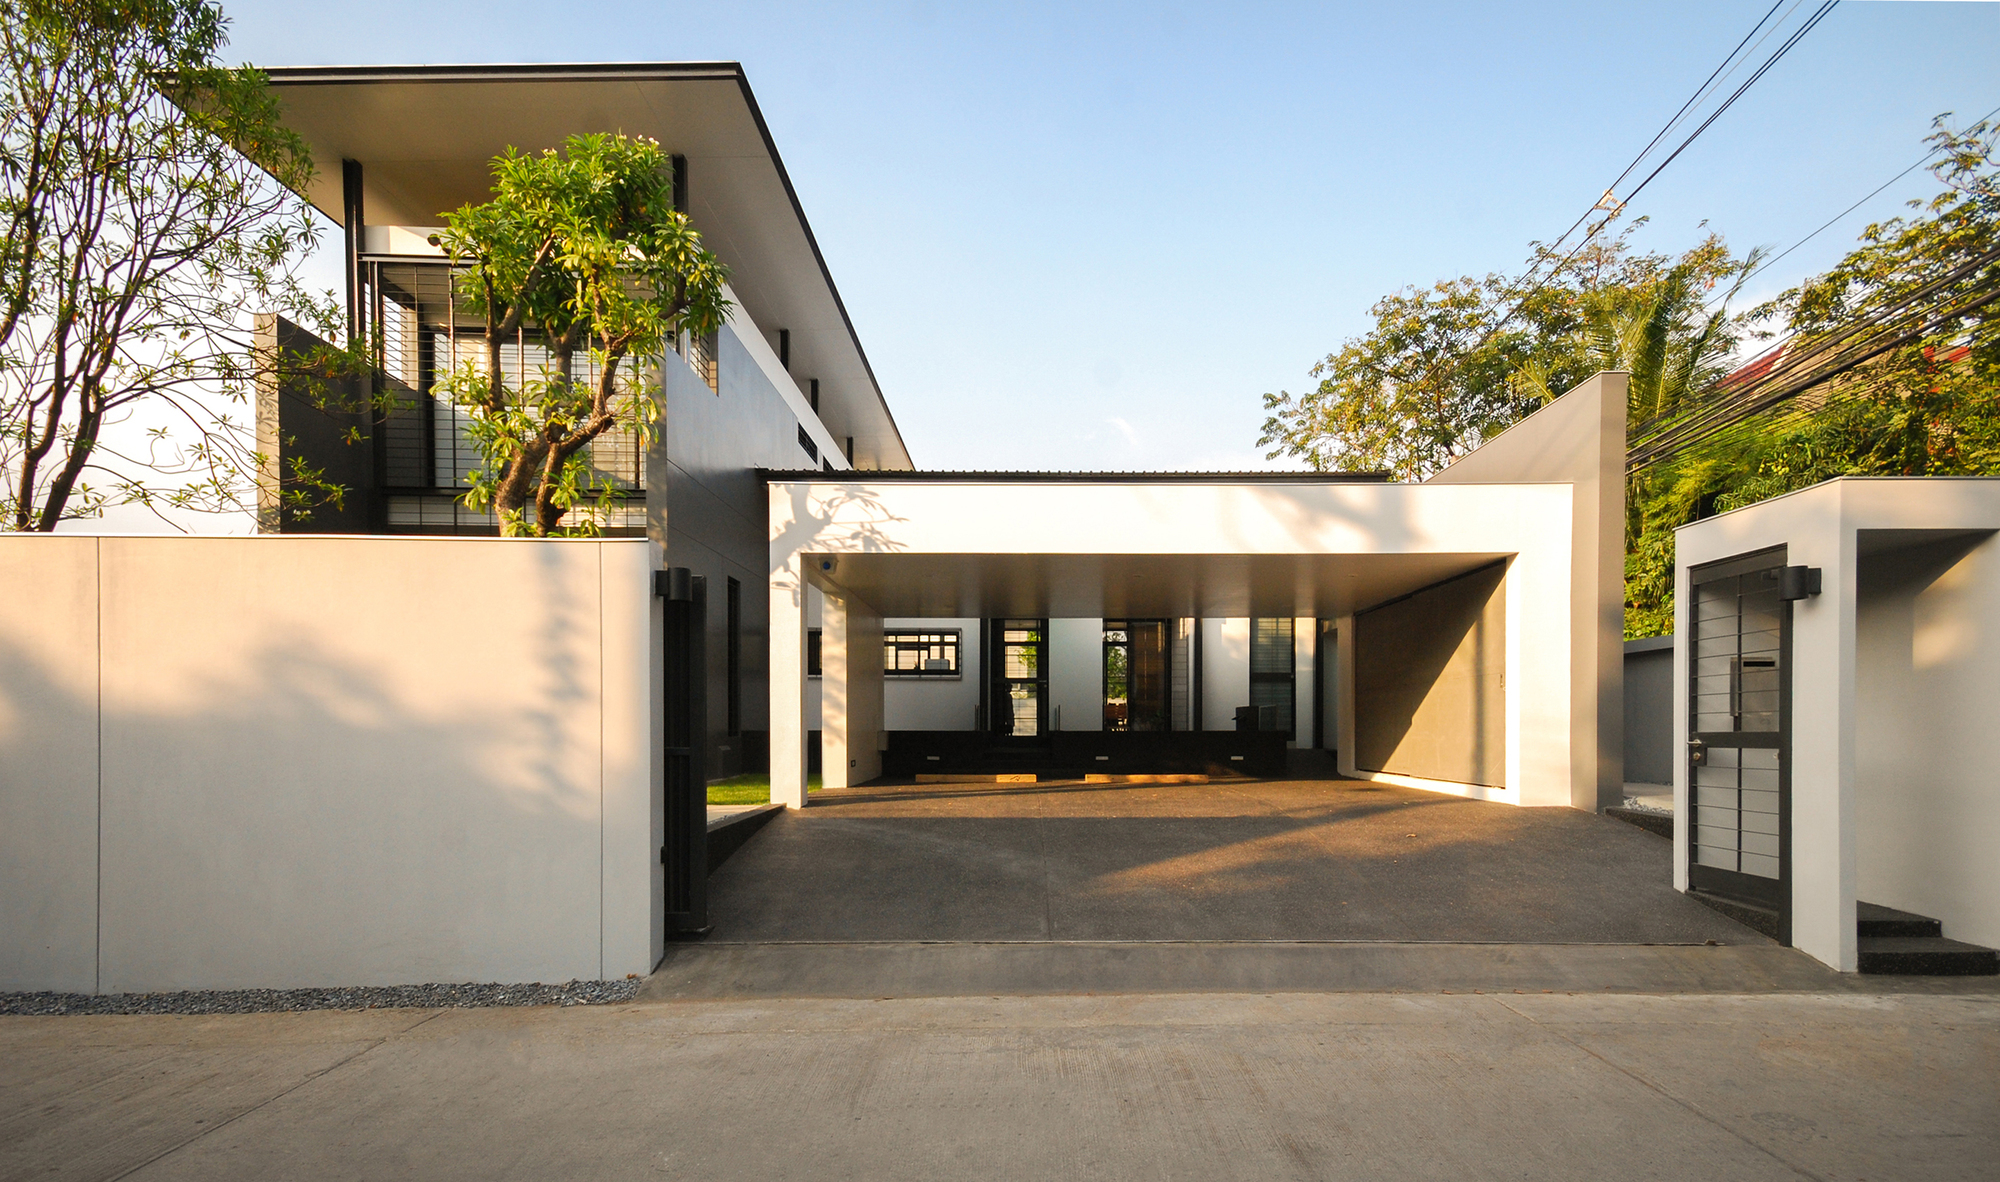 Galer De Three House Junsekino Architect And Design - 7